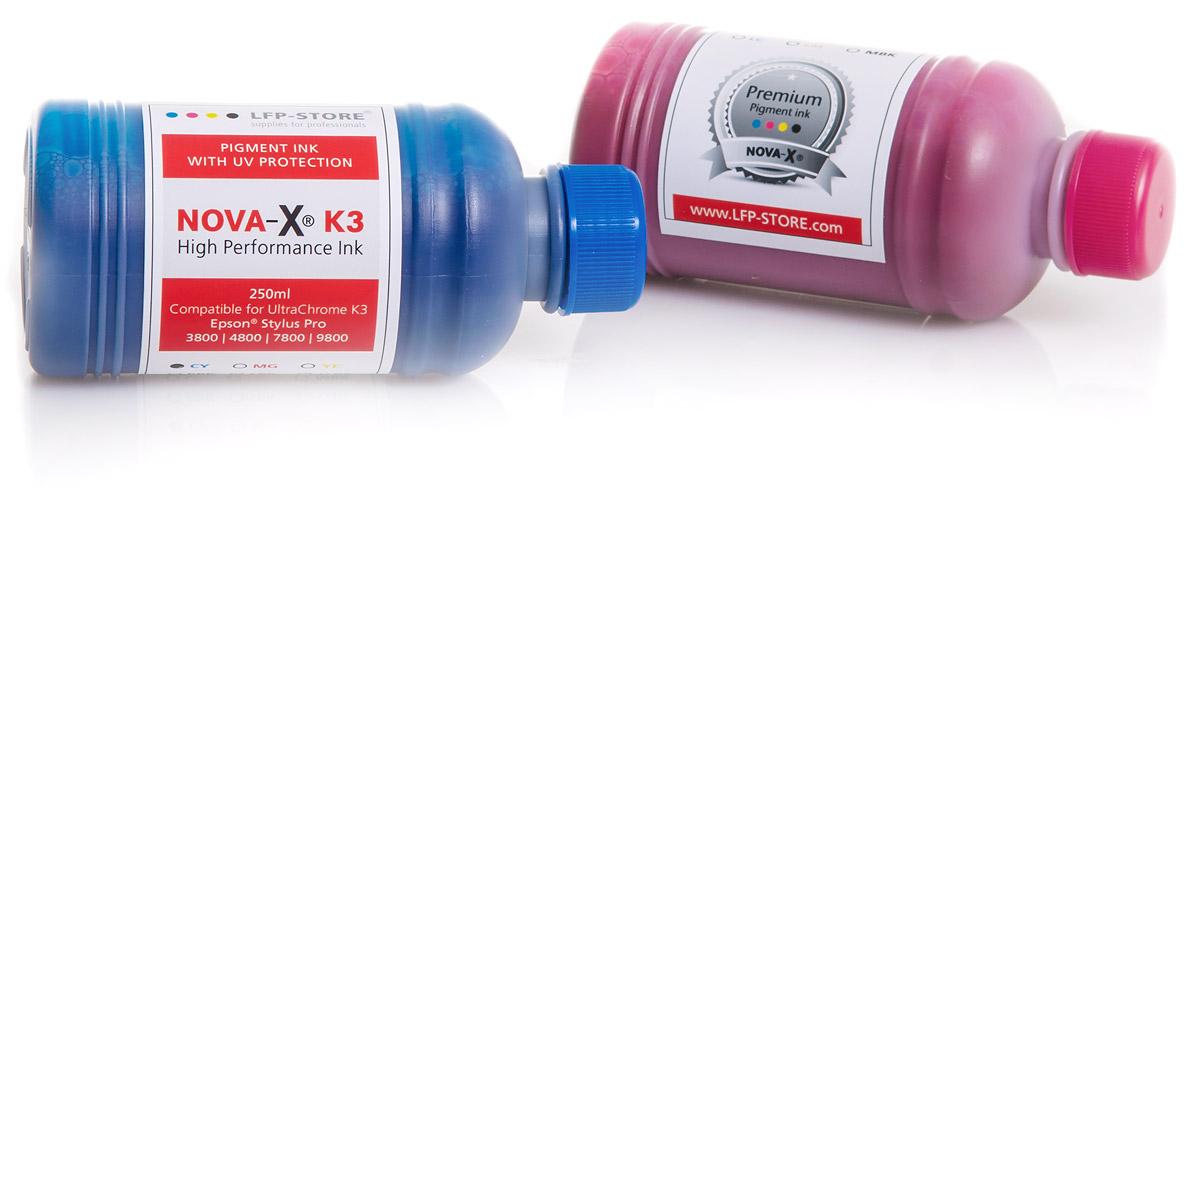 250ml NOVA-X® K3 Pigmenttinte kompatibel Epson Stylus Pro 3800 4800 7800 9800